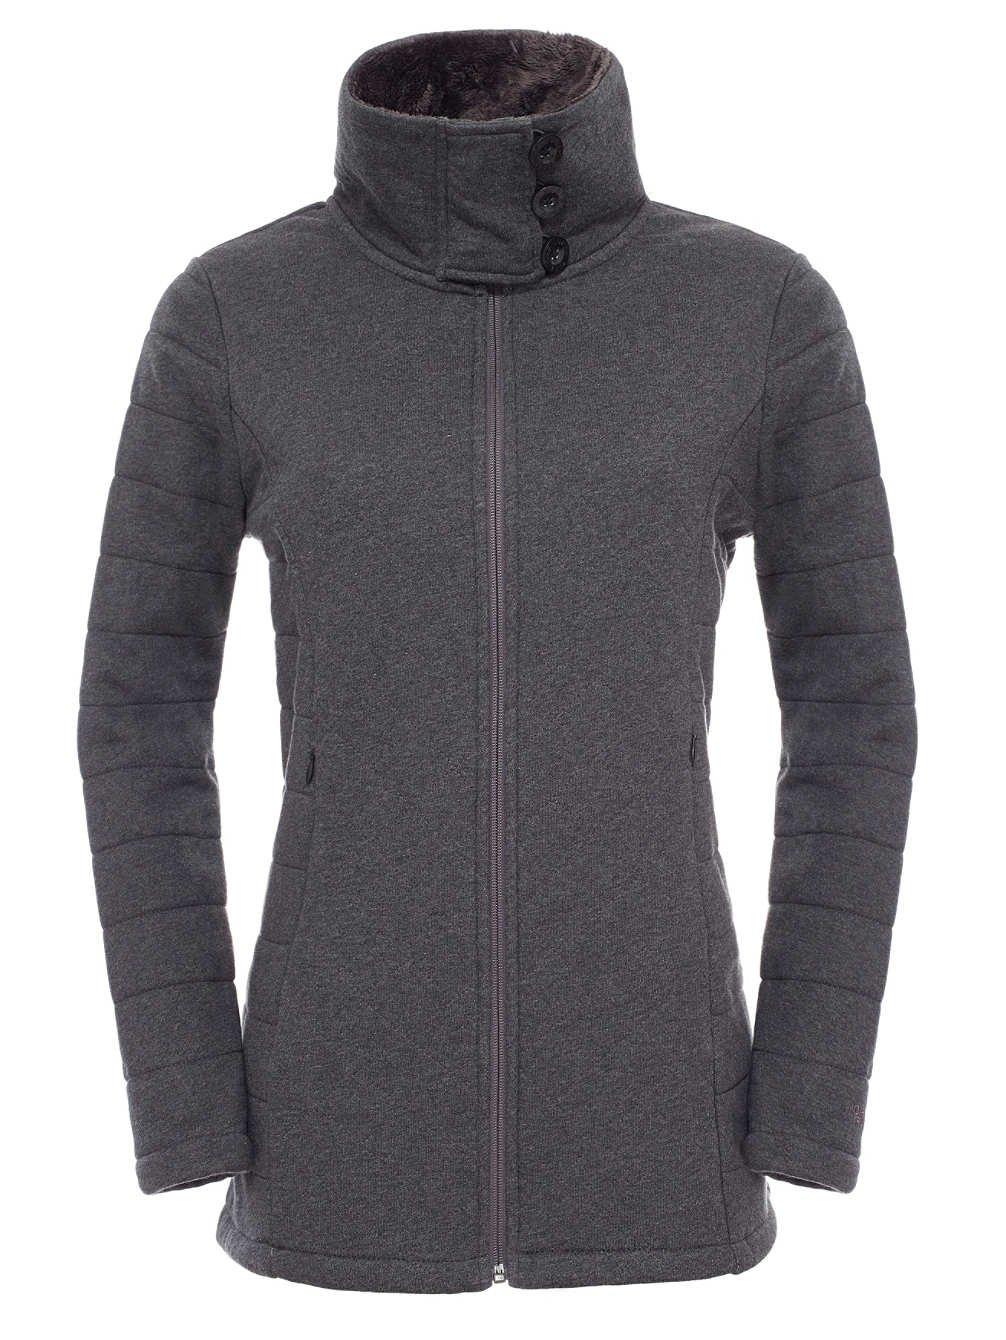 The North Face Caroluna Übergangsjacke Damen online kaufen